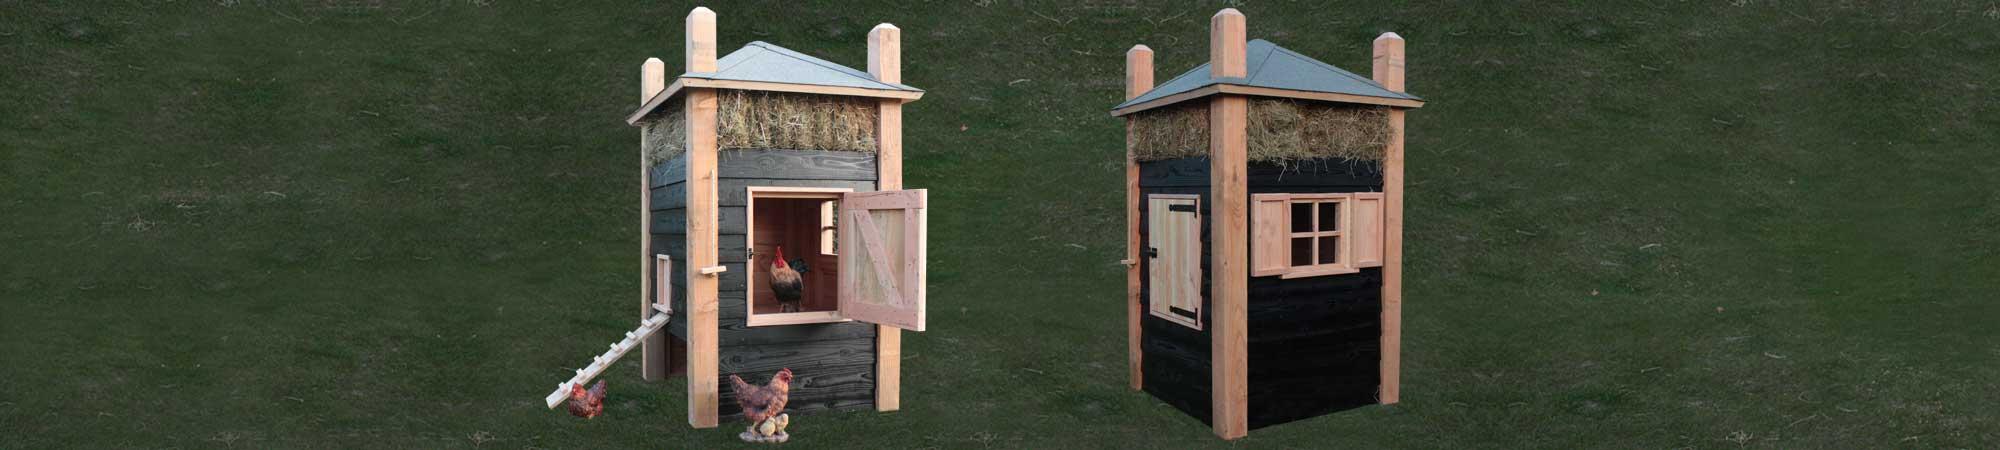 header2-zwarte-hooiberg-met-raam-kippen1